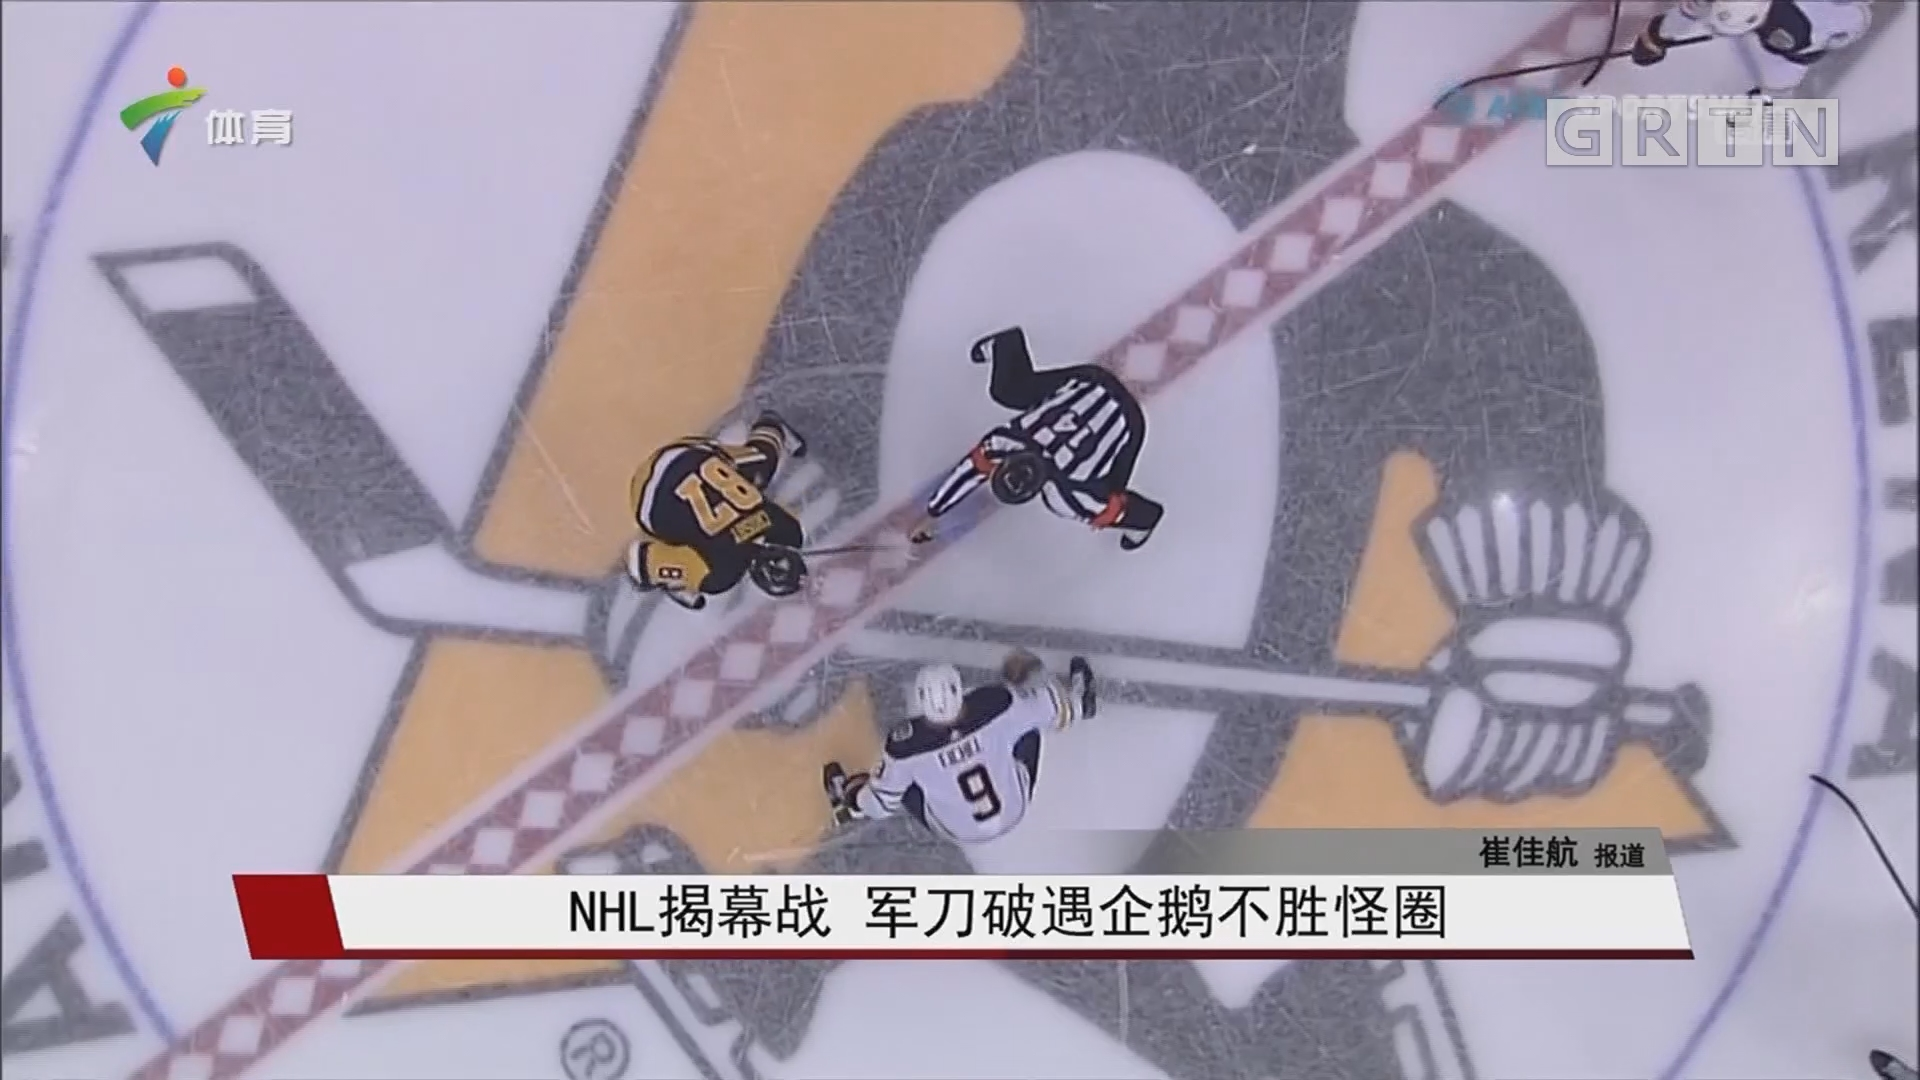 NHL揭幕戰 軍刀破遇企鵝不勝怪圈